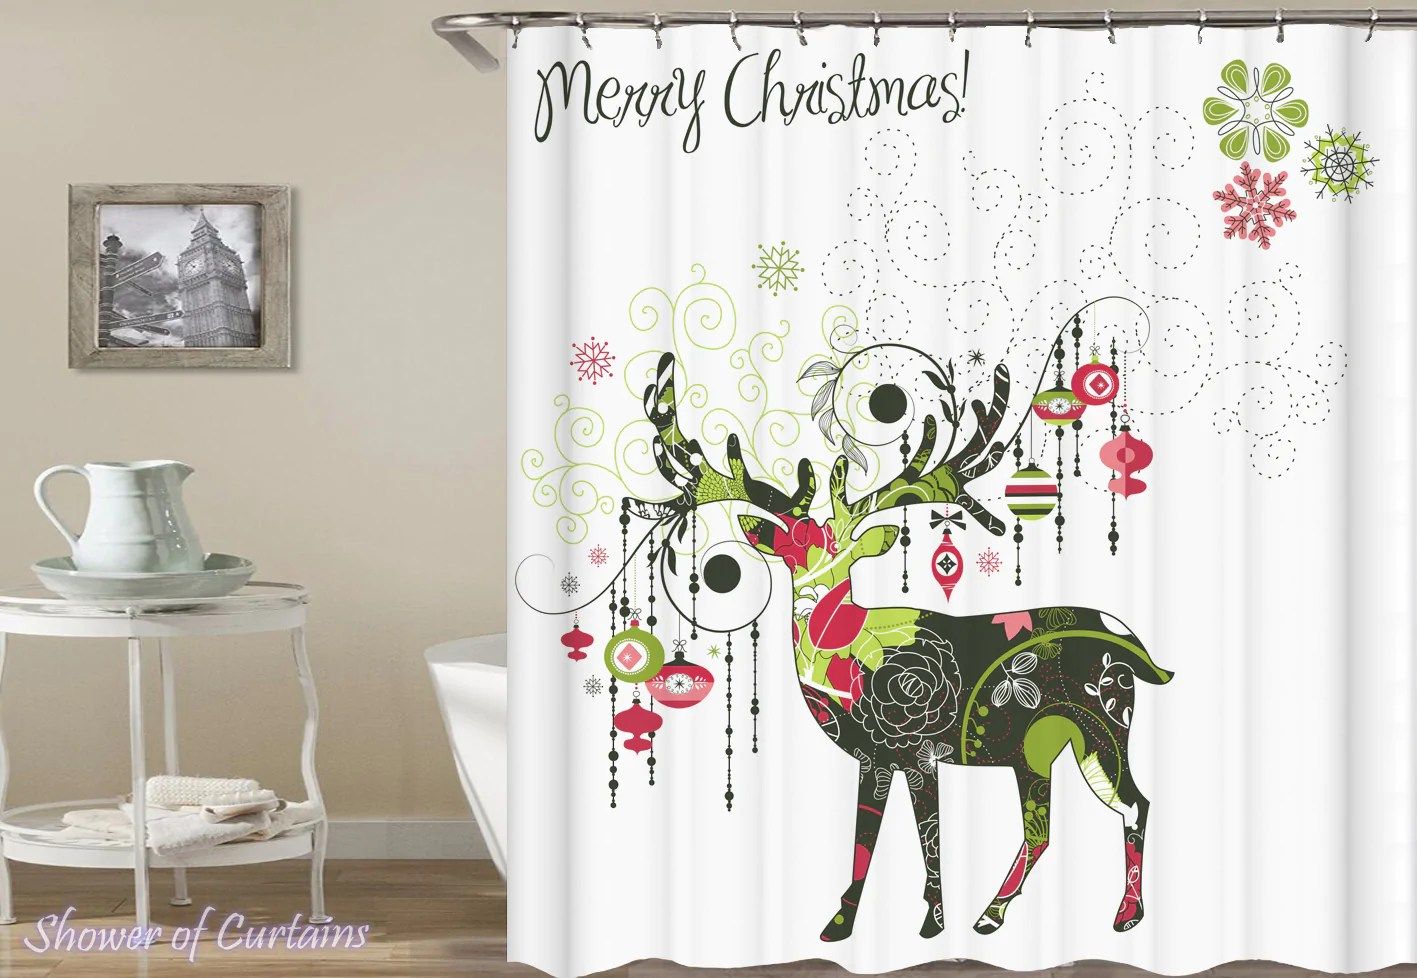 merry christmas decorative reindeer